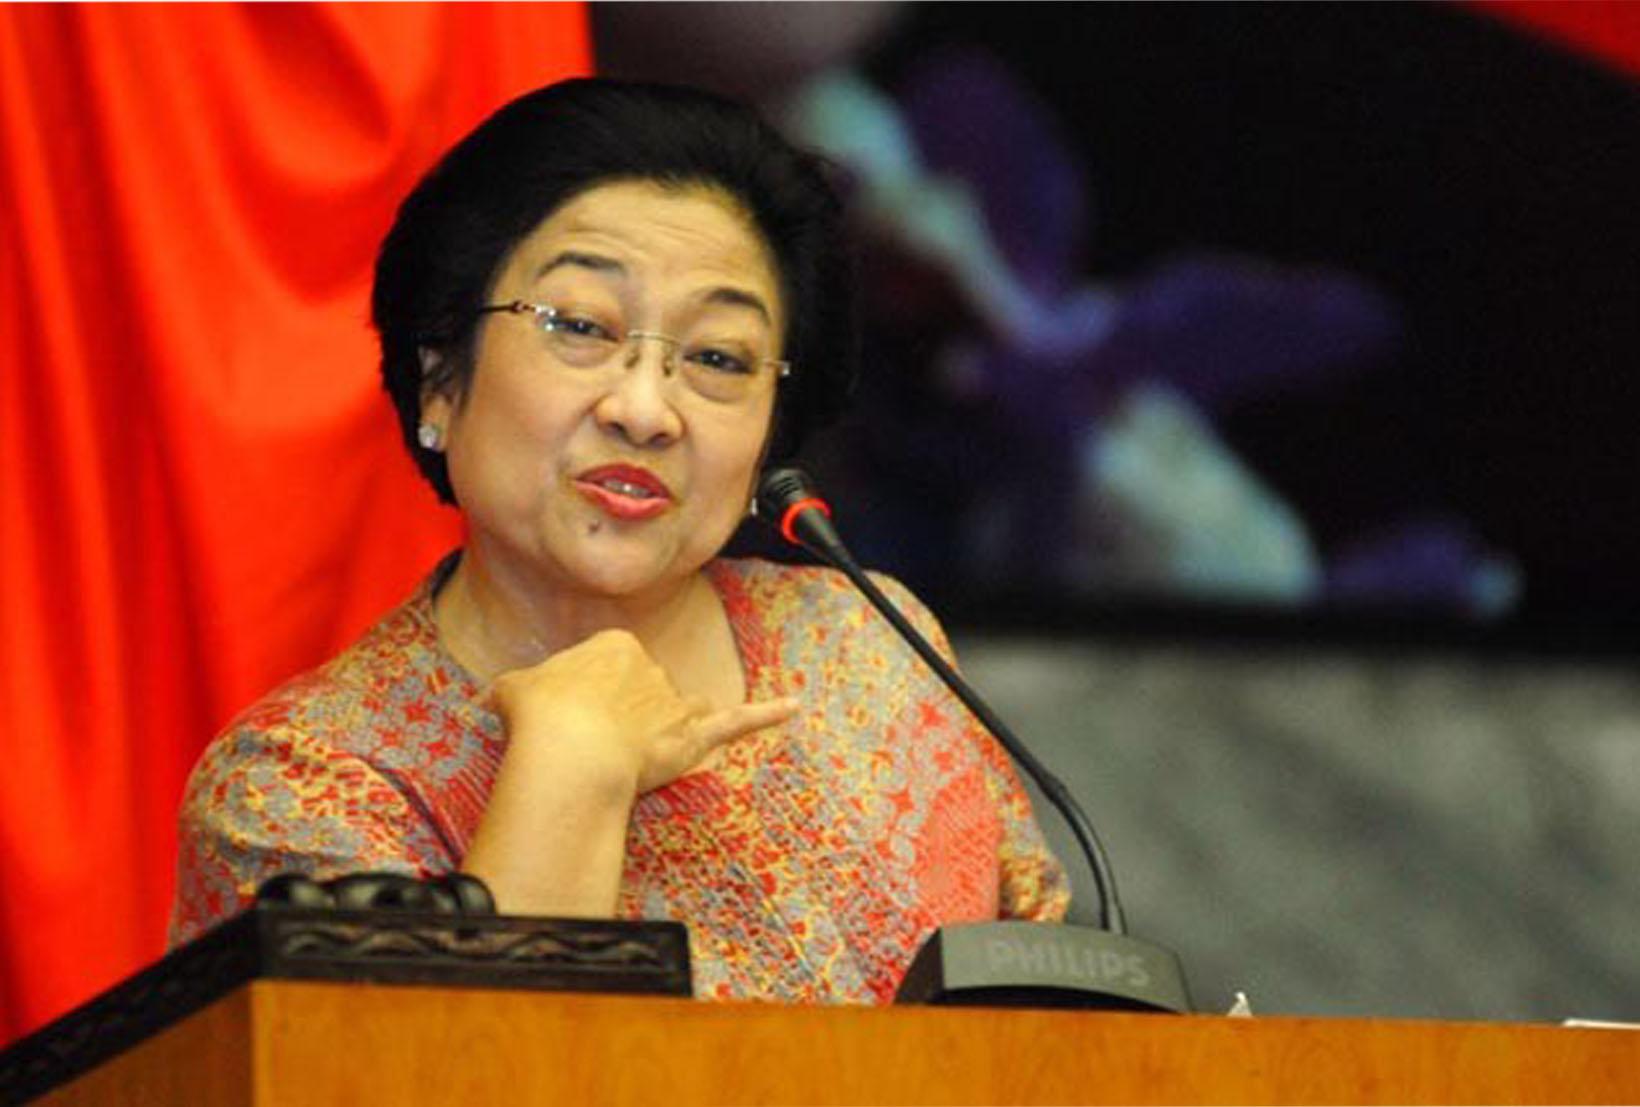 Beri Masukan Soal Penanganan Bencana di Indonesia, Megawati: Ini Saya Bukan Mau Cari Nama Lho Ya!